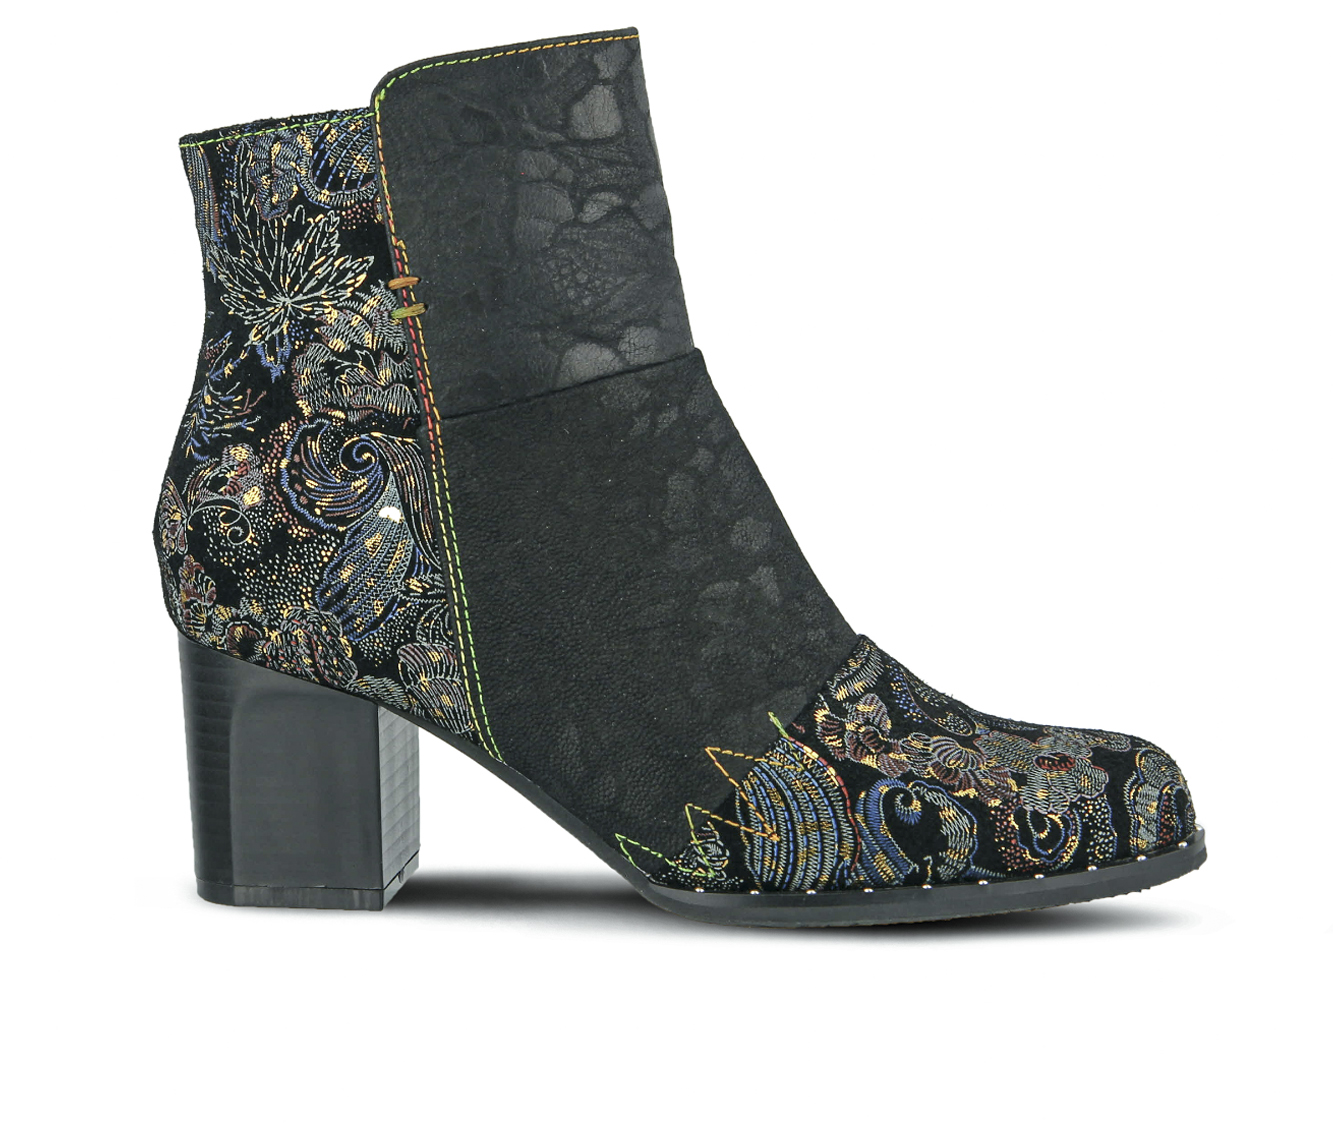 L'Artiste Jewells Women's Boots (Black Leather)